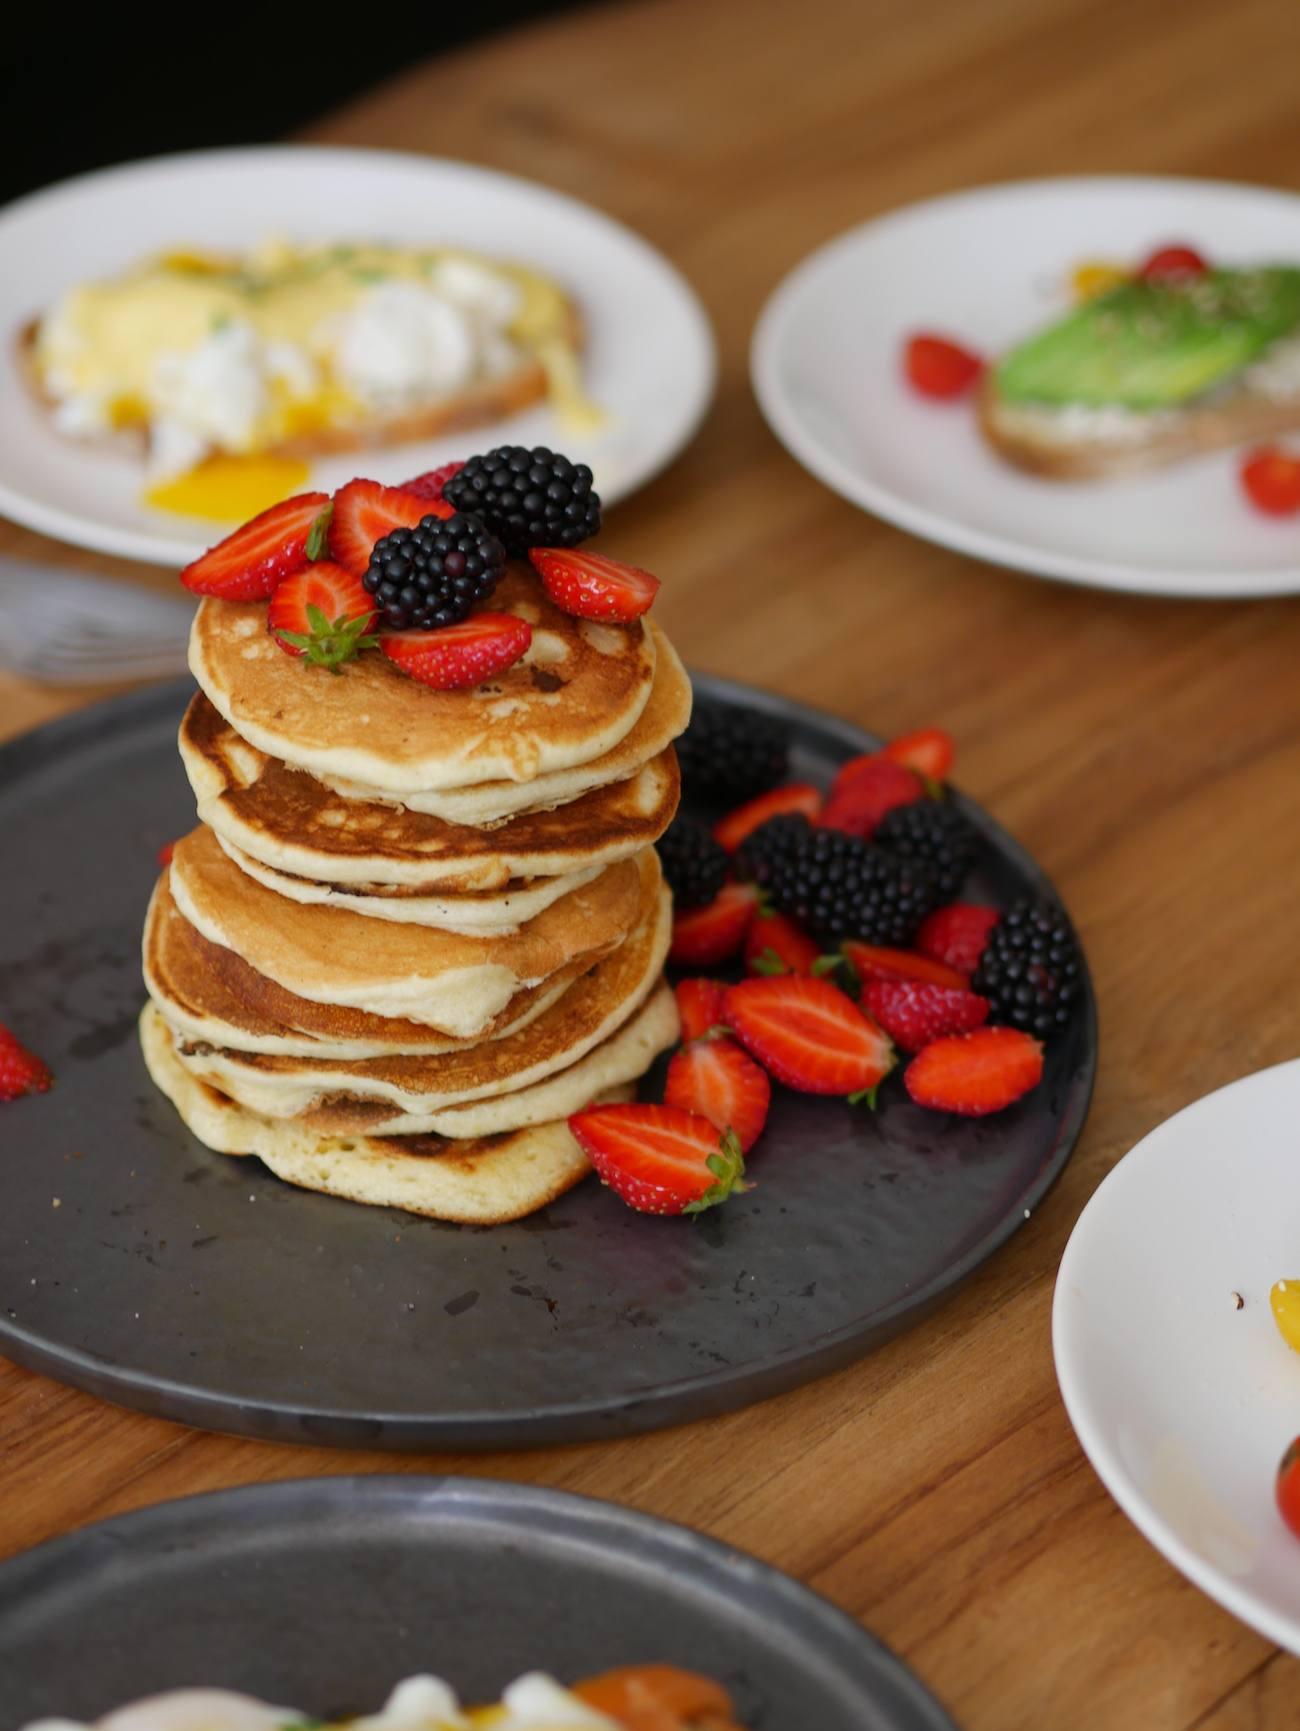 brunch-maison-recette-pancakes-toast-oeuf-benedicte-infuz-12